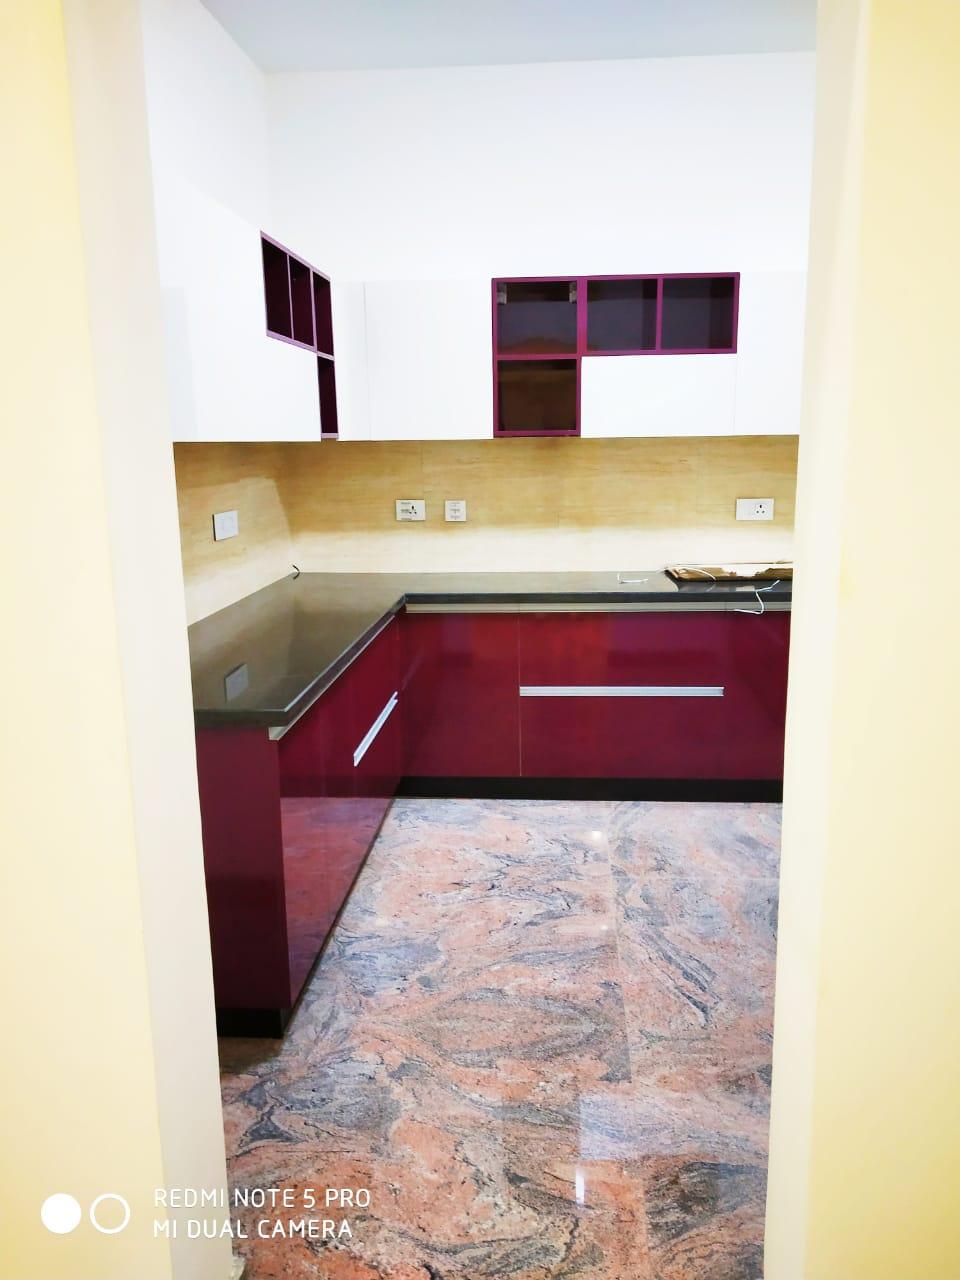 BSCPL-Bollineni-Astra-Kogilu-Cross-Apartments-Bangalore-Gallery-7